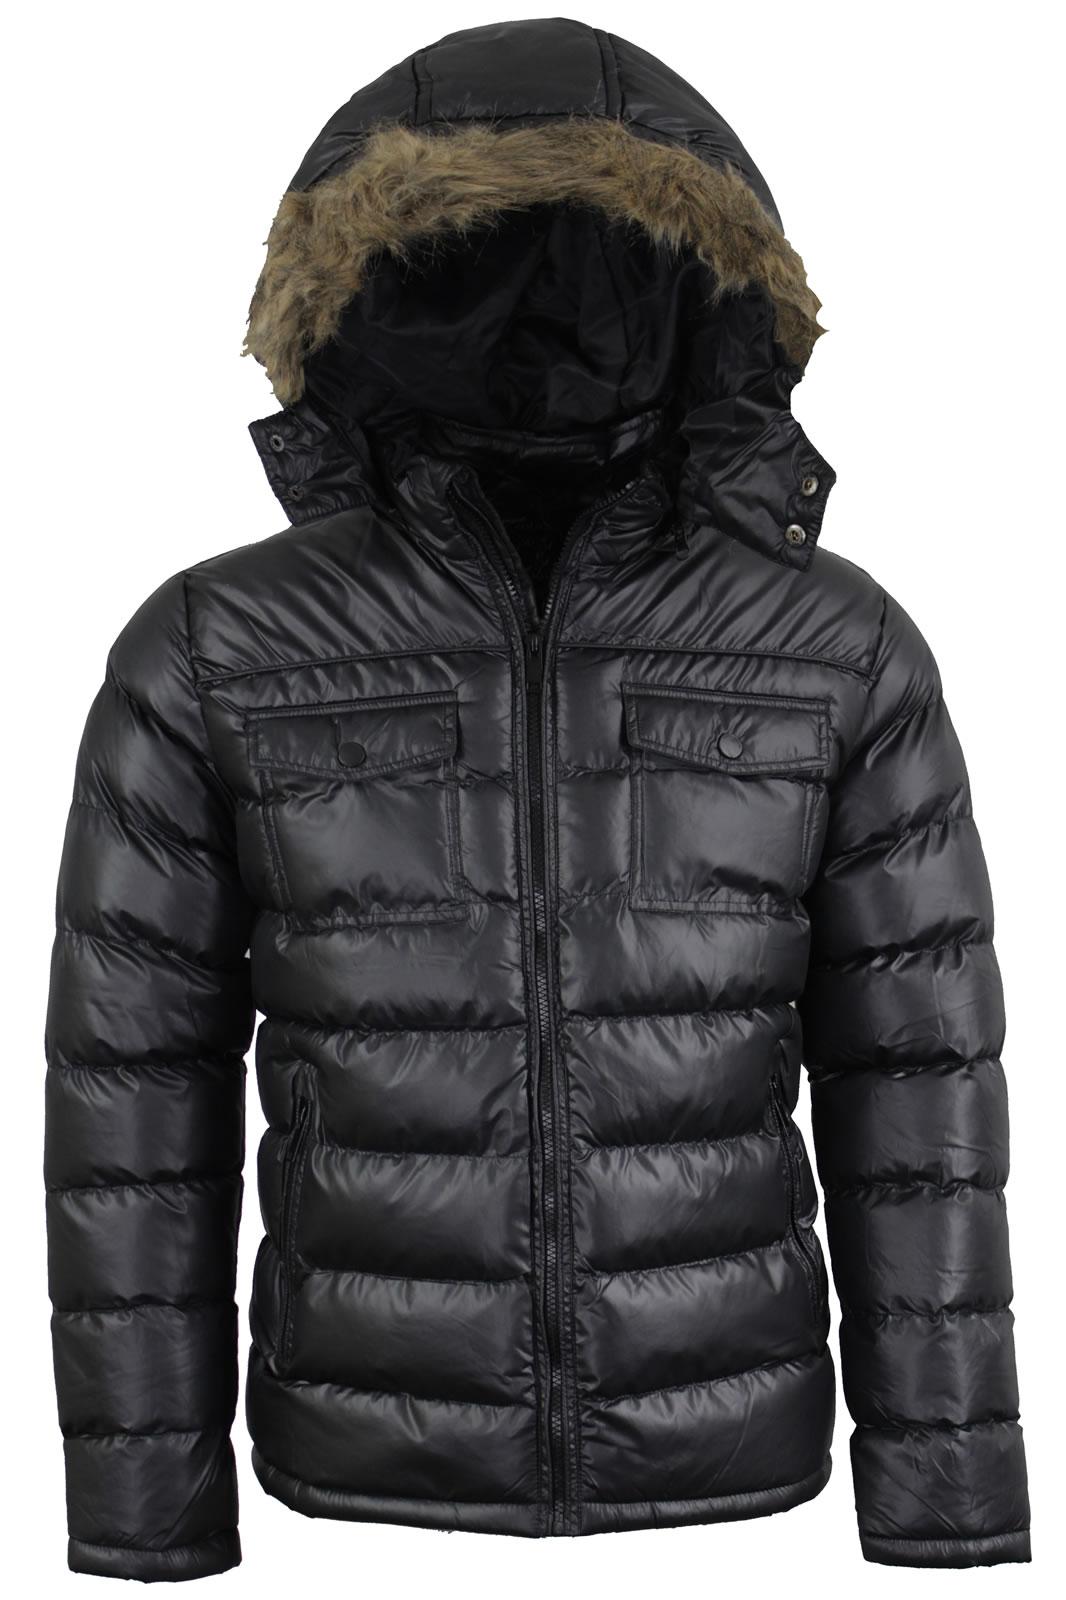 ad5313af3 Details about Mens Brave SouL Faux Fur Hooded Winter Puffer Jacket In Black  AW18